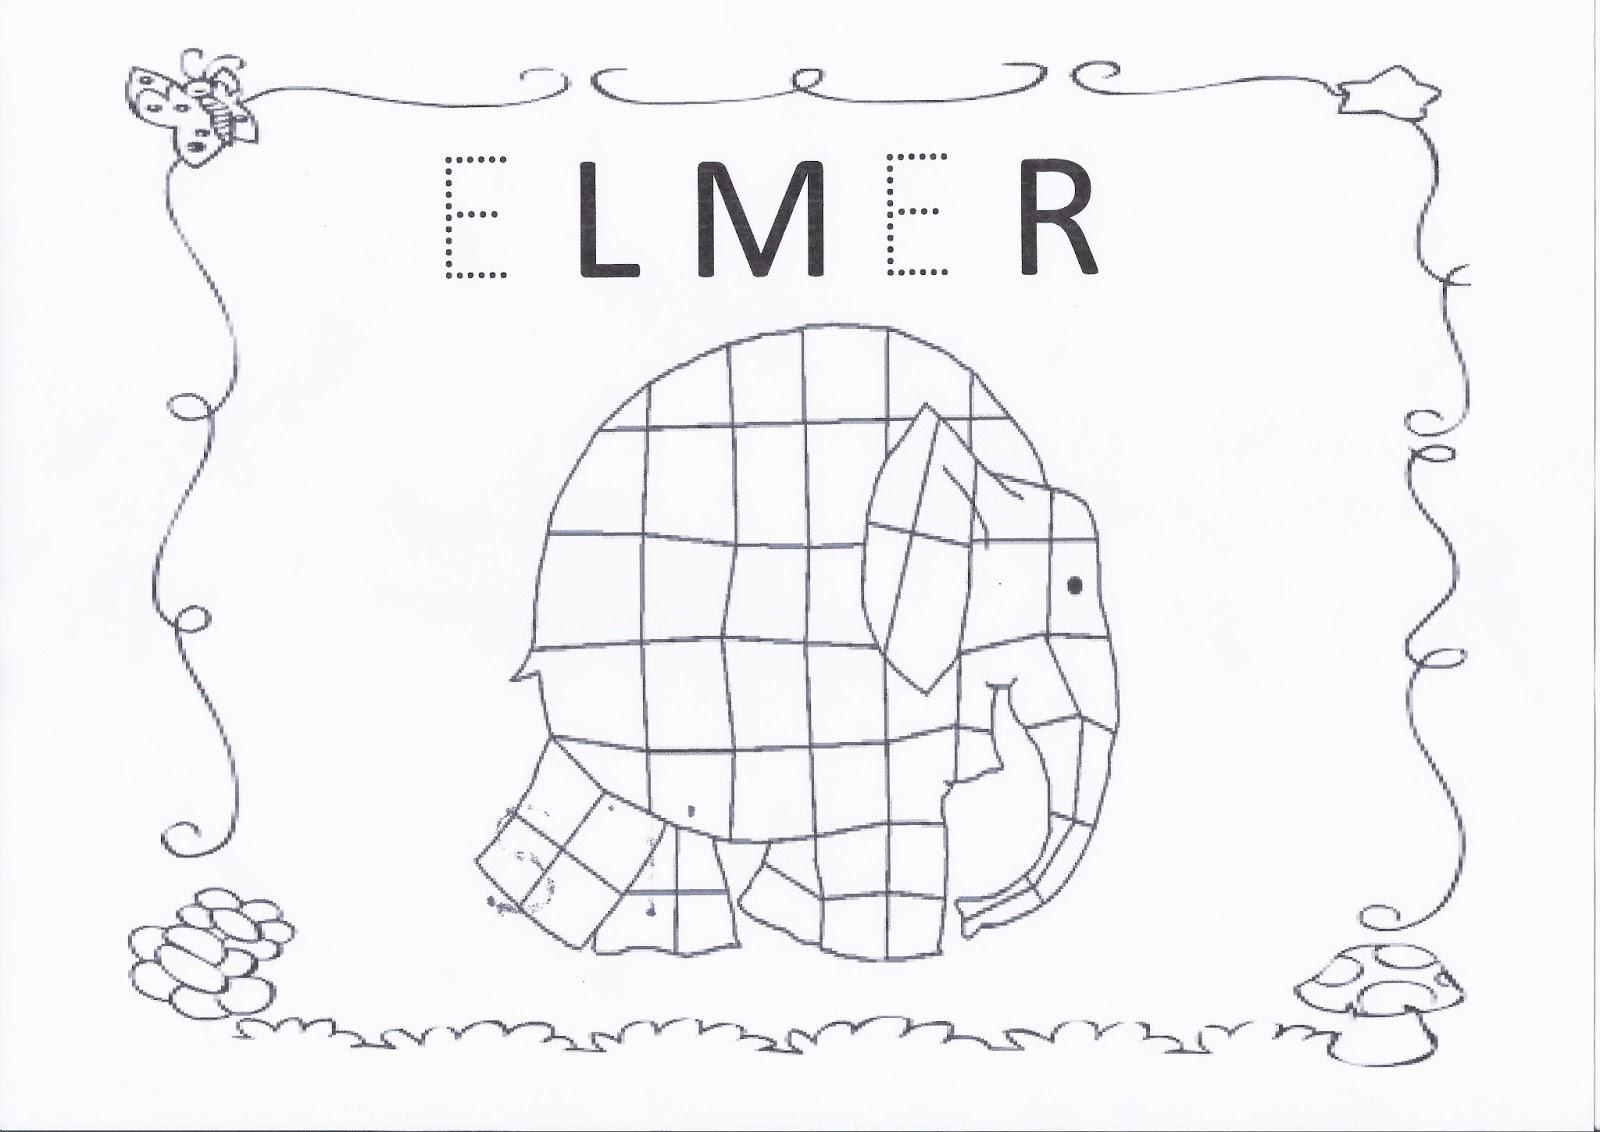 Fichas Elmer 8 Imagenes Educativas